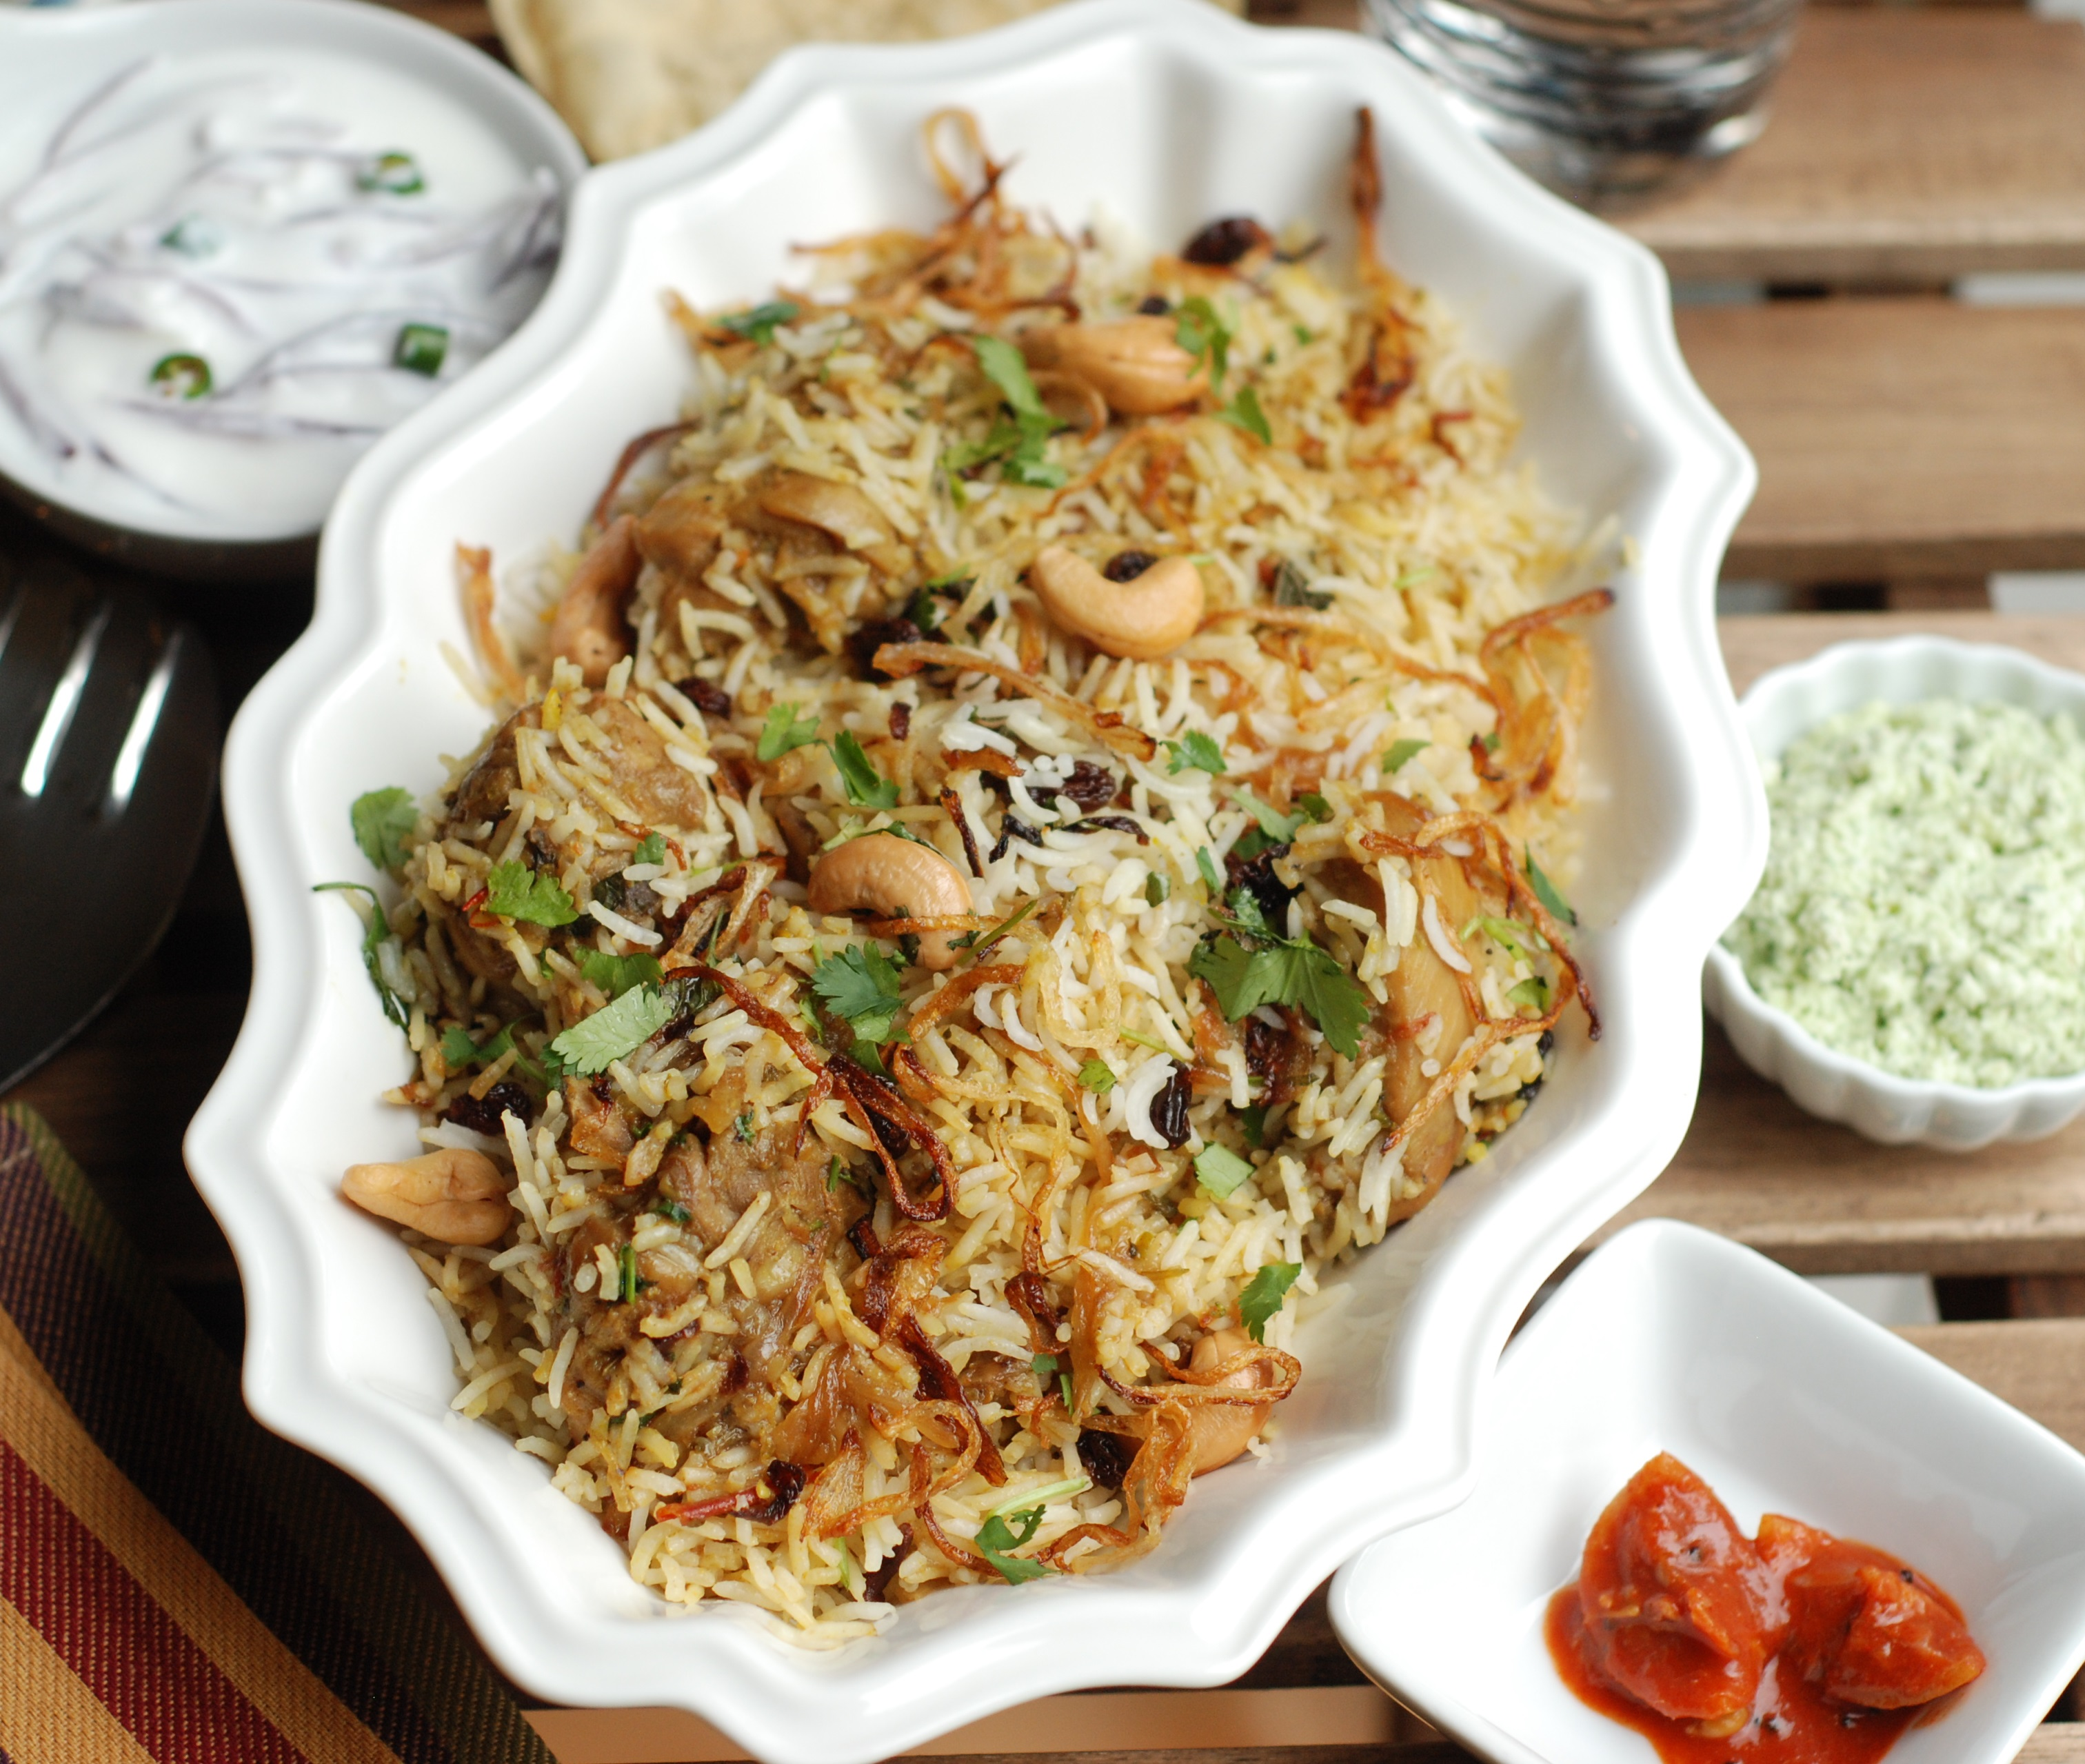 thalasseri-chicken-biriyani2